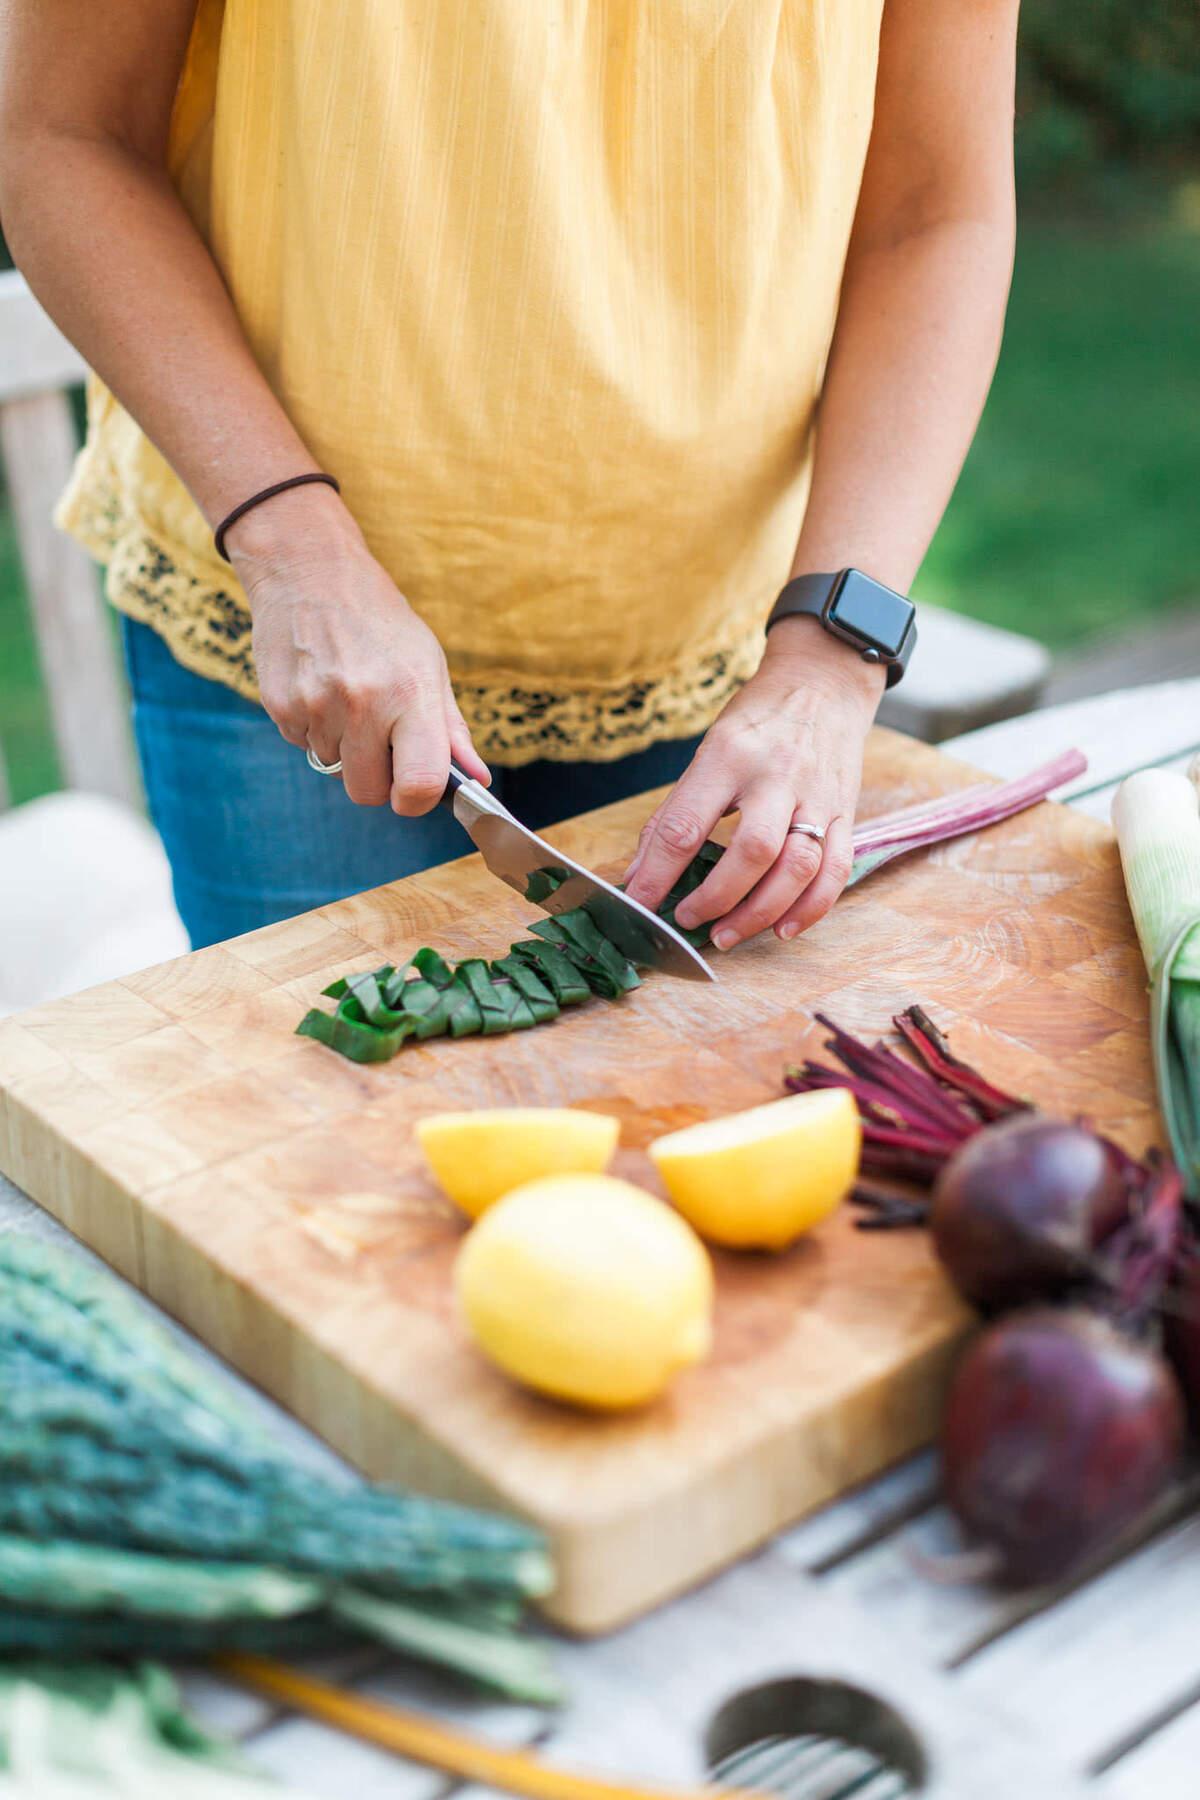 Branding shoot for female nutritionist, cutting vegetables